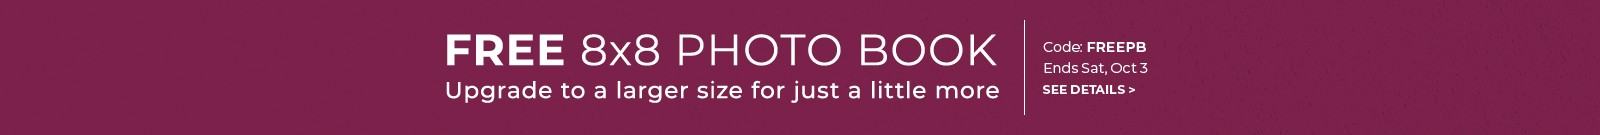 Free 8x8 Photo Book